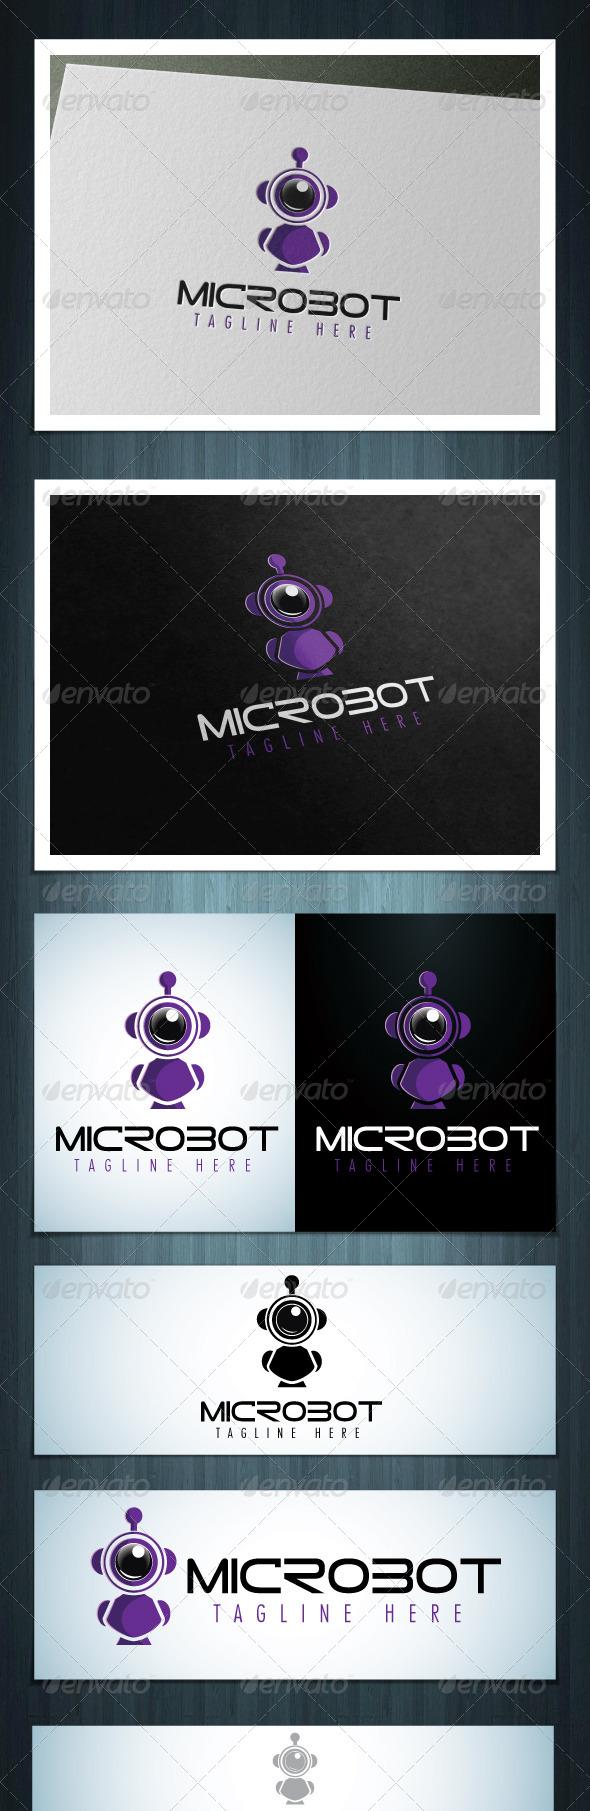 GraphicRiver Microbot 5821449